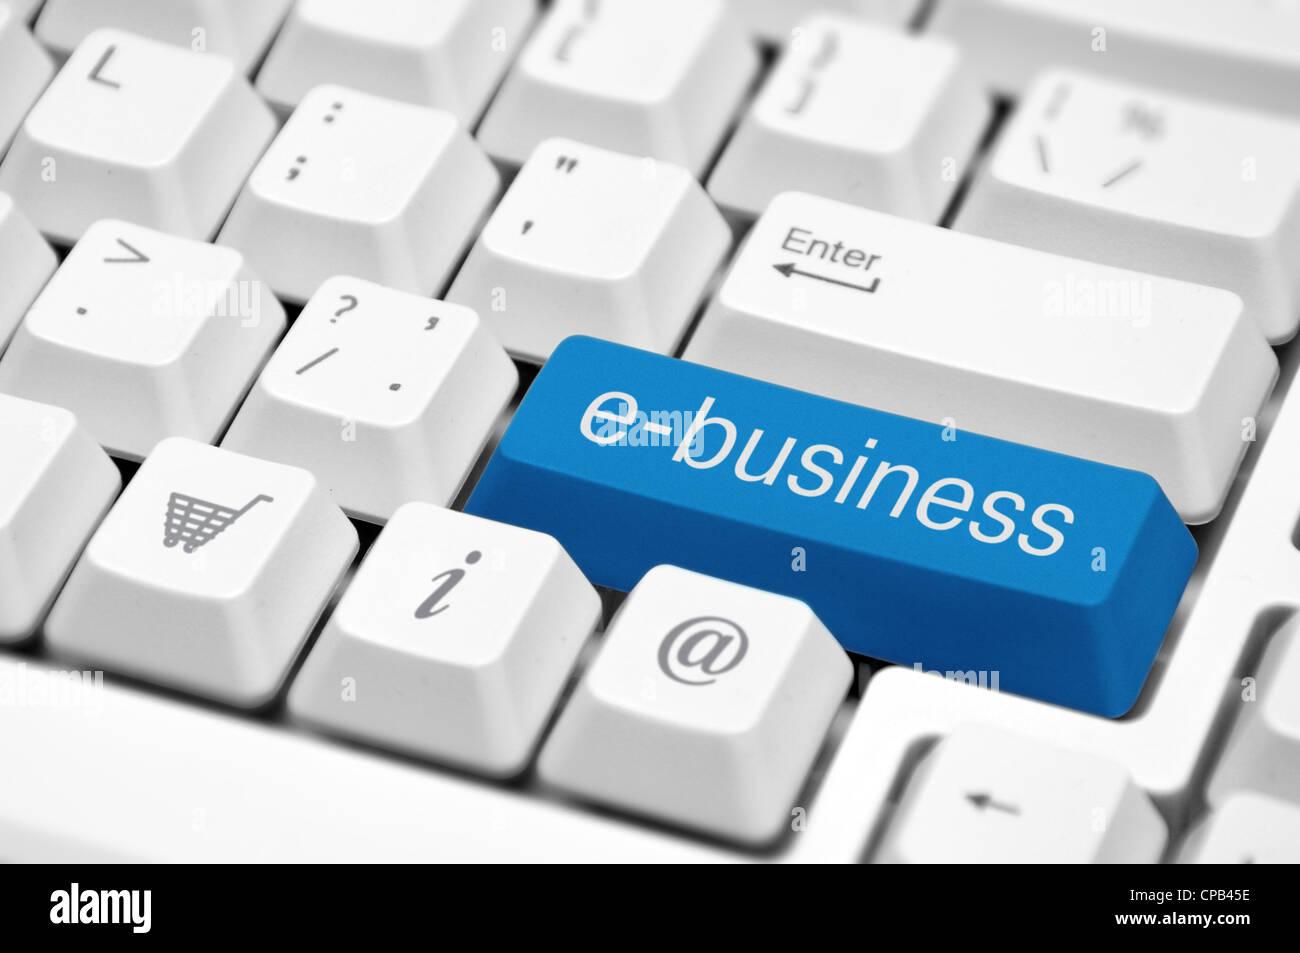 e-business key on a white keyboard closeup. E-business concept image. - Stock Image